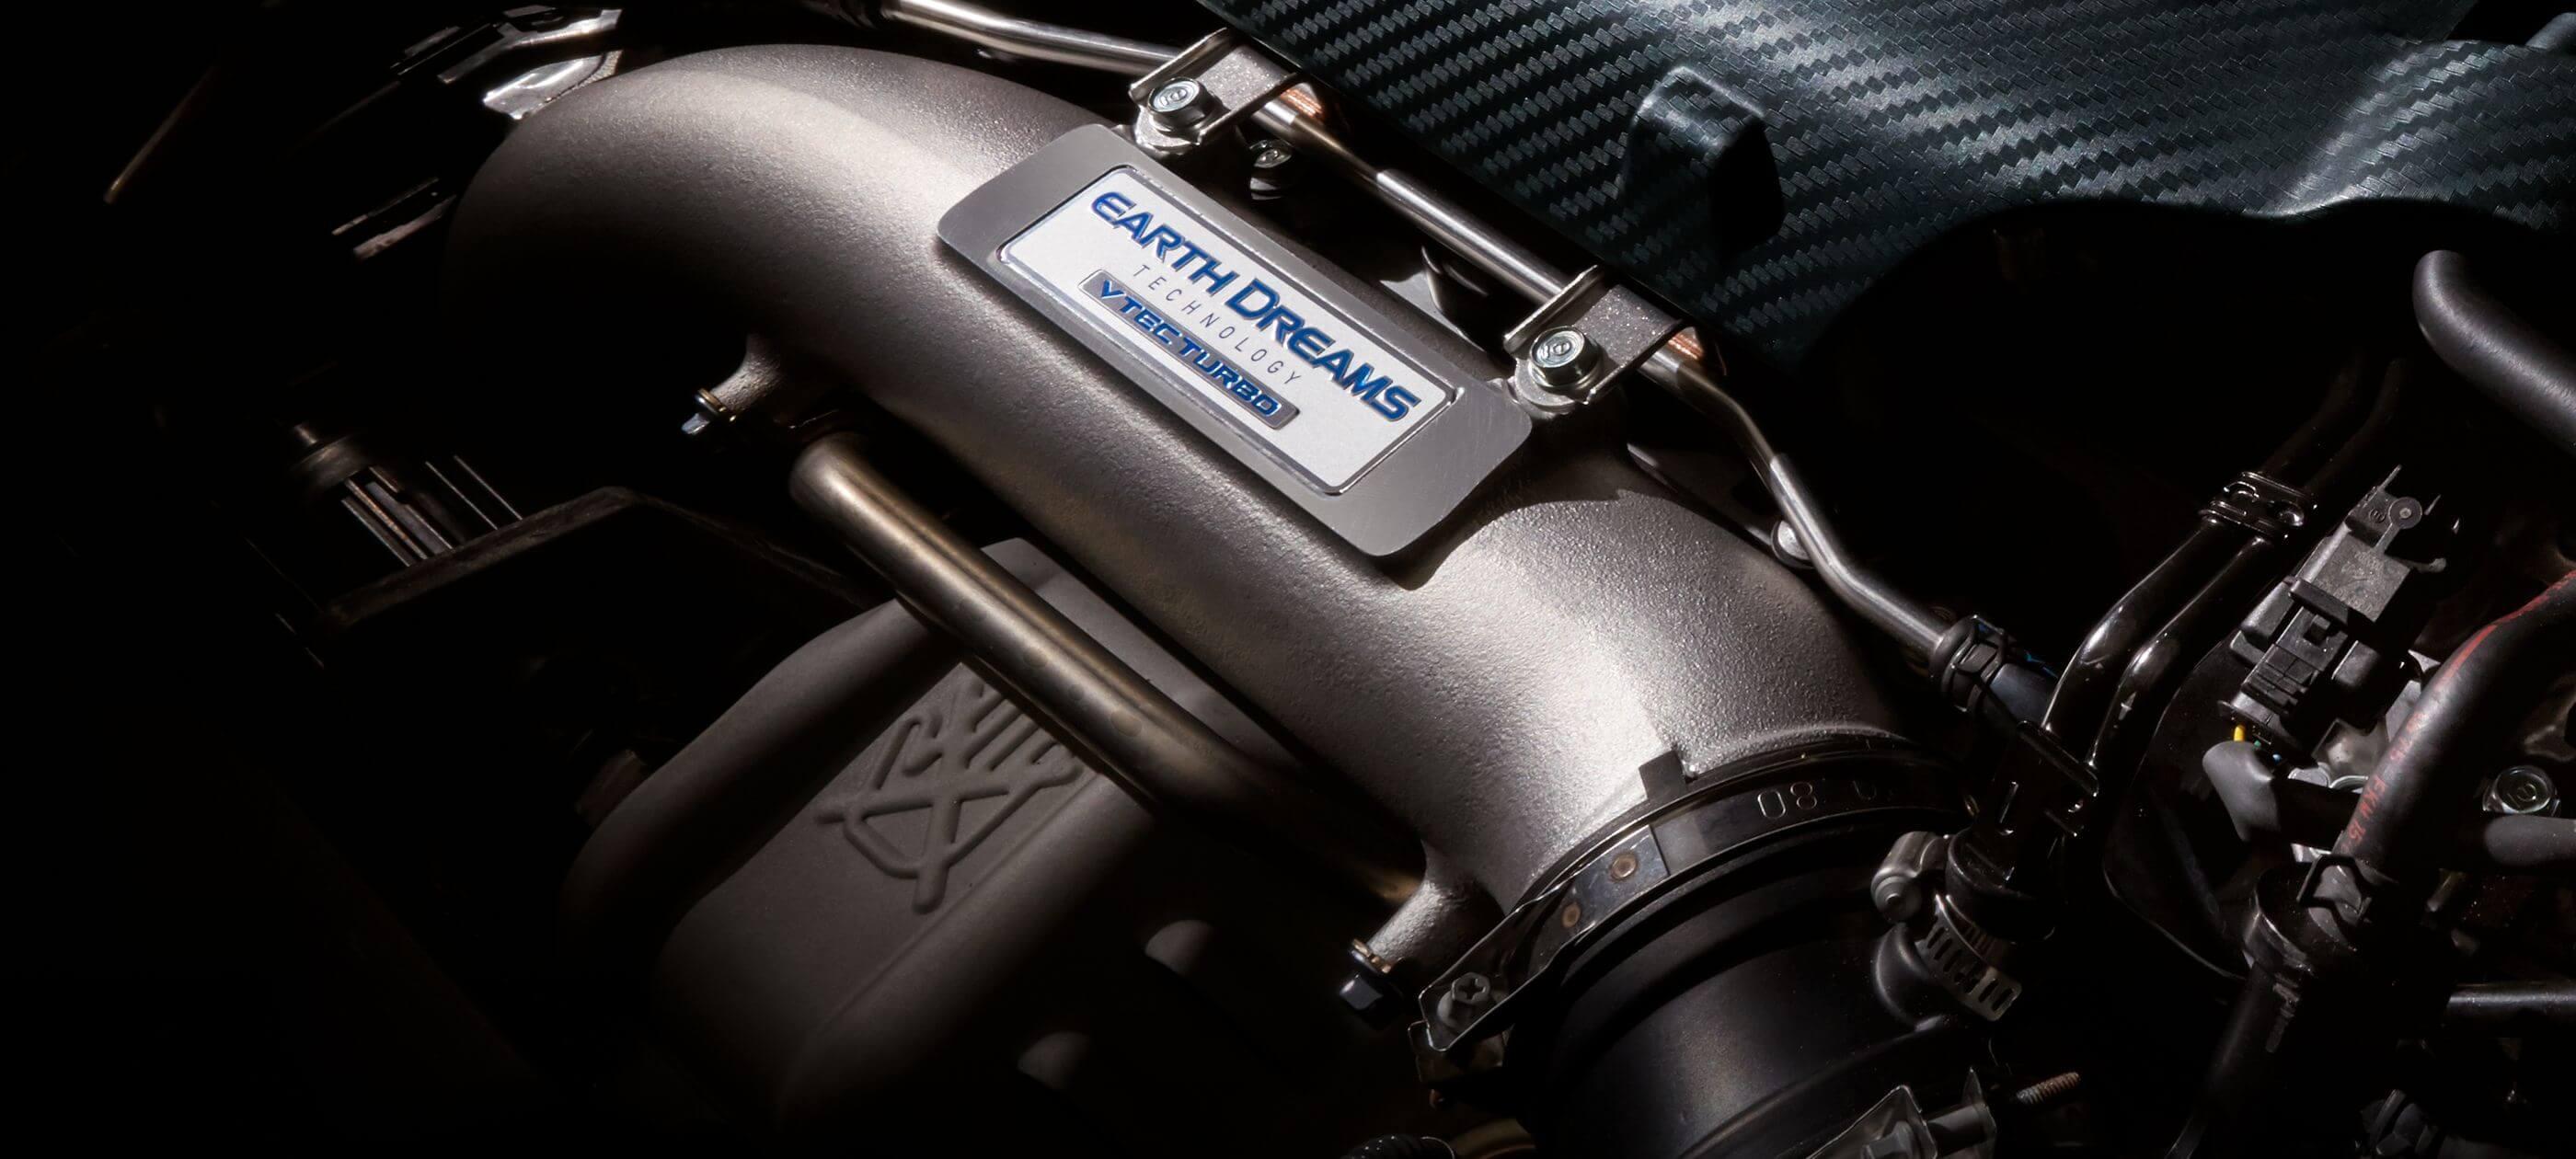 Par motor turboalimentado